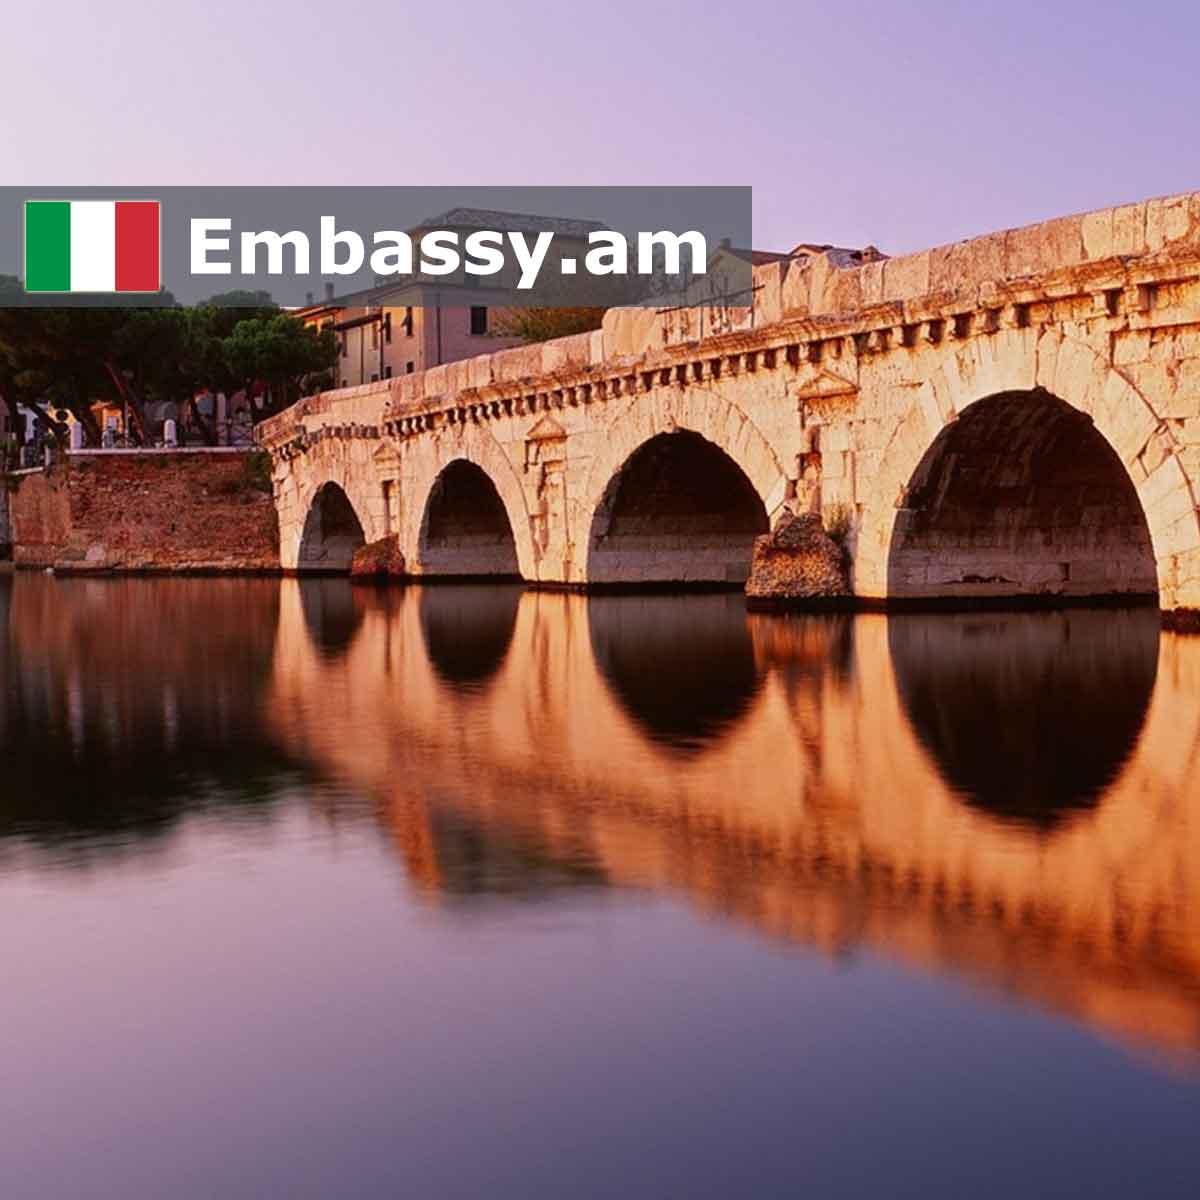 Rimini - Hotels in Italy - Embassy.am